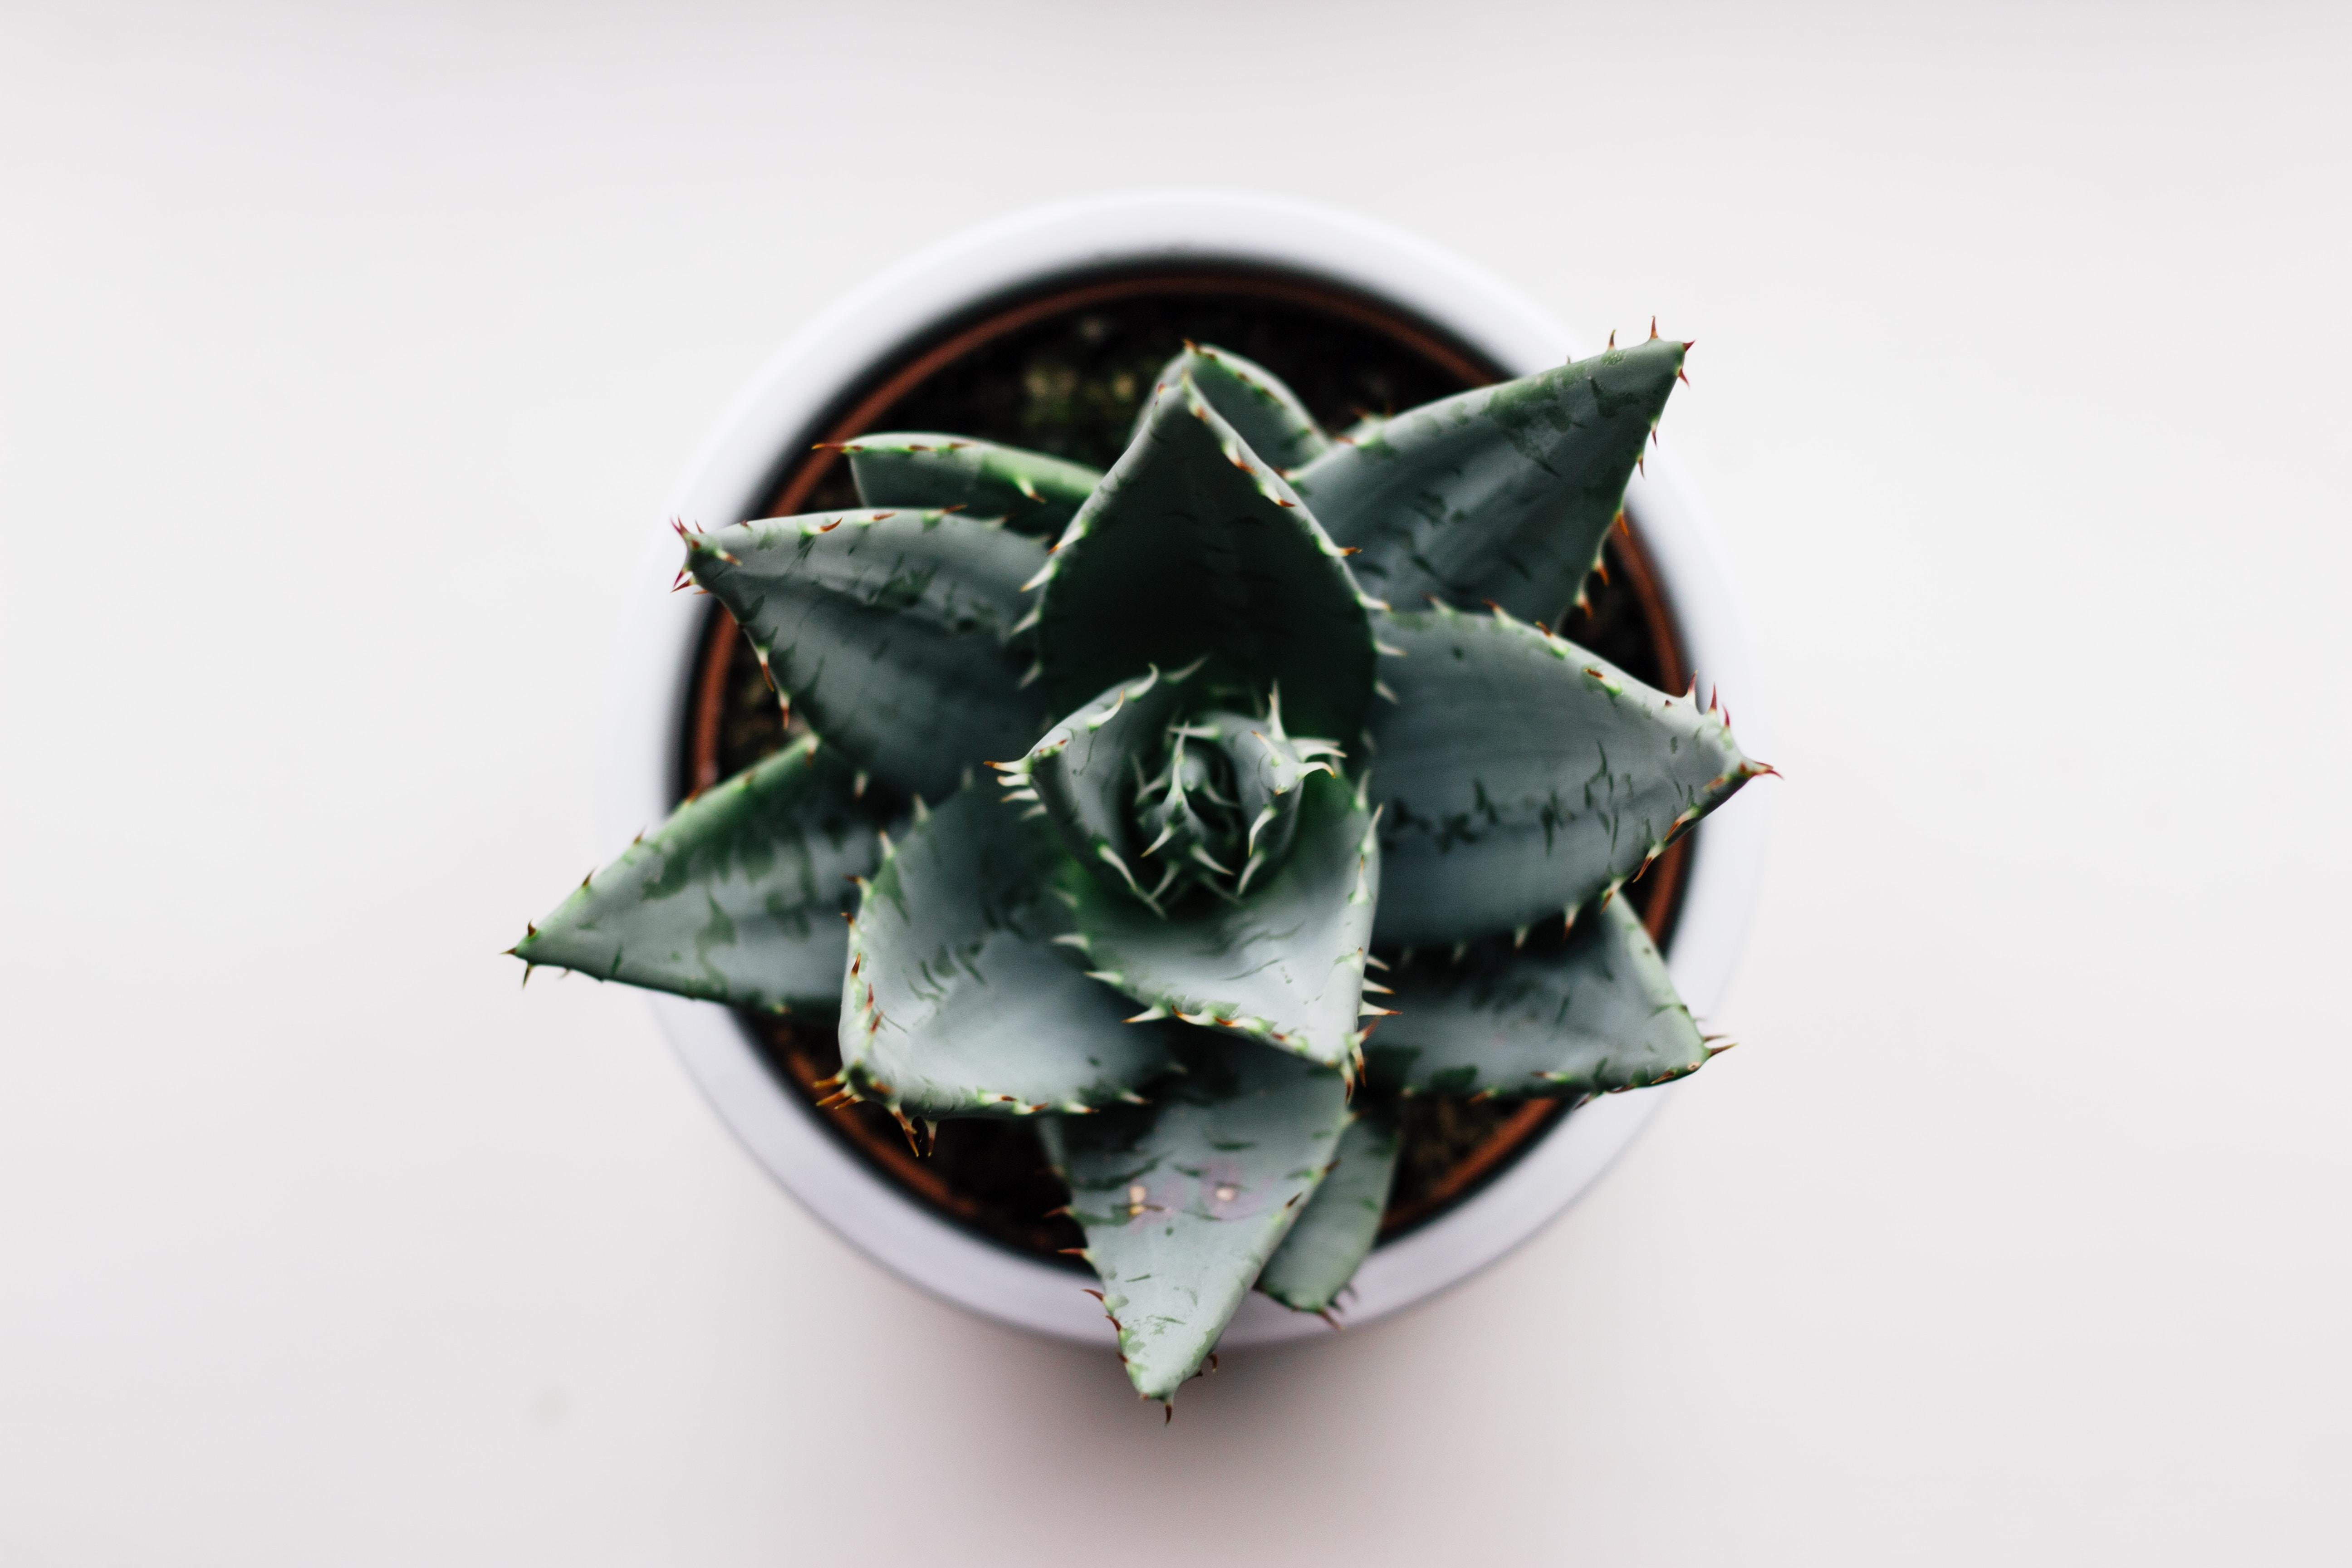 green cactus on brown pot